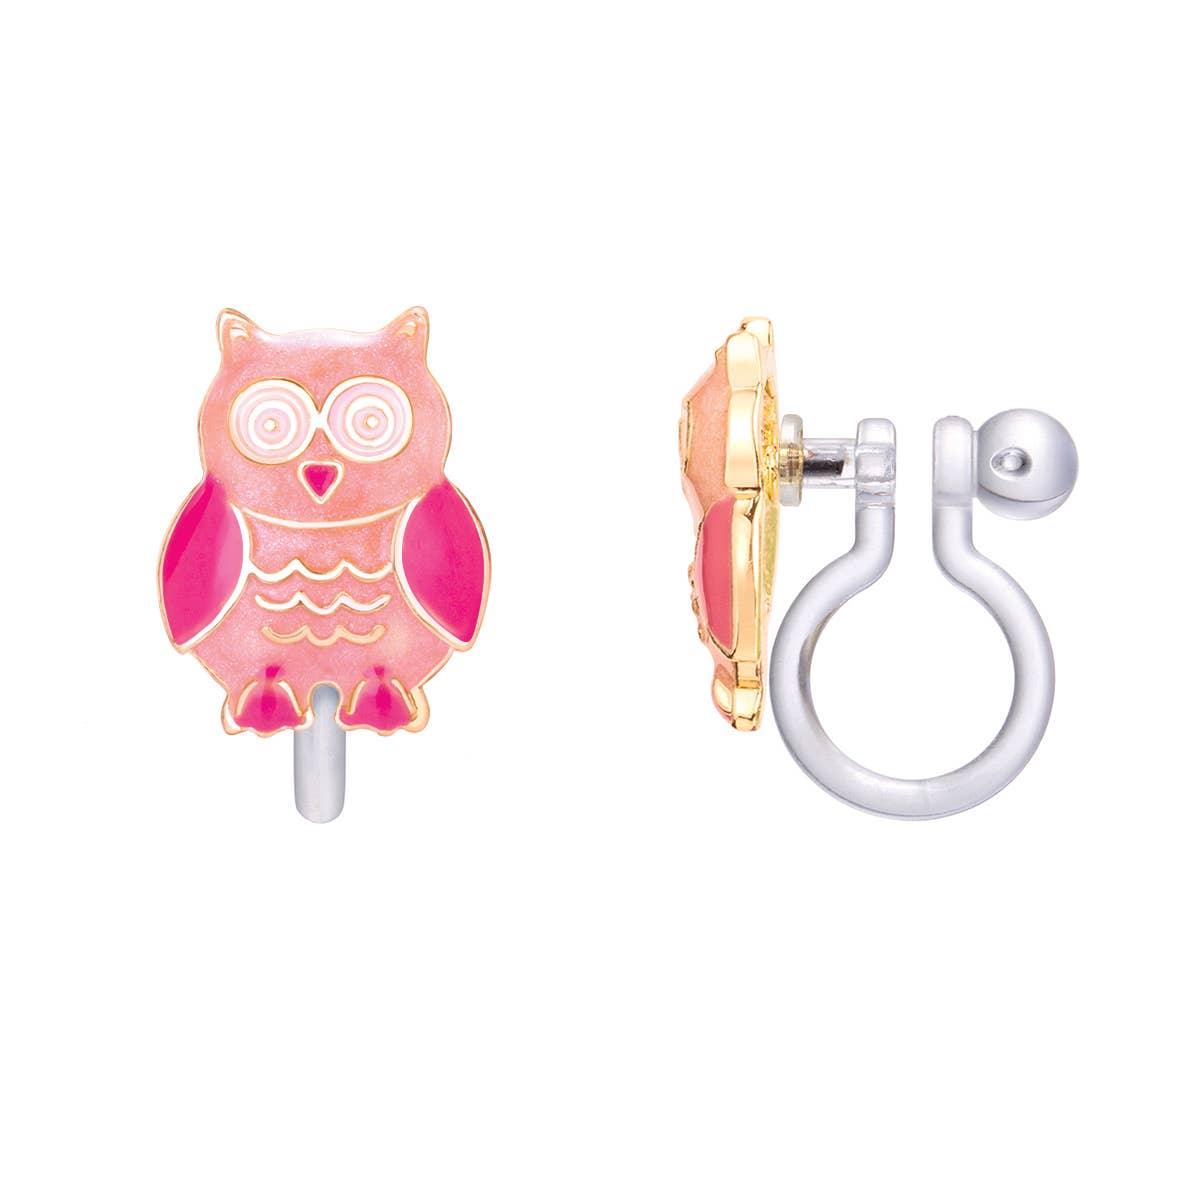 CLIP ON Cutie Earrings- Woodland Owl   Trada Marketplace